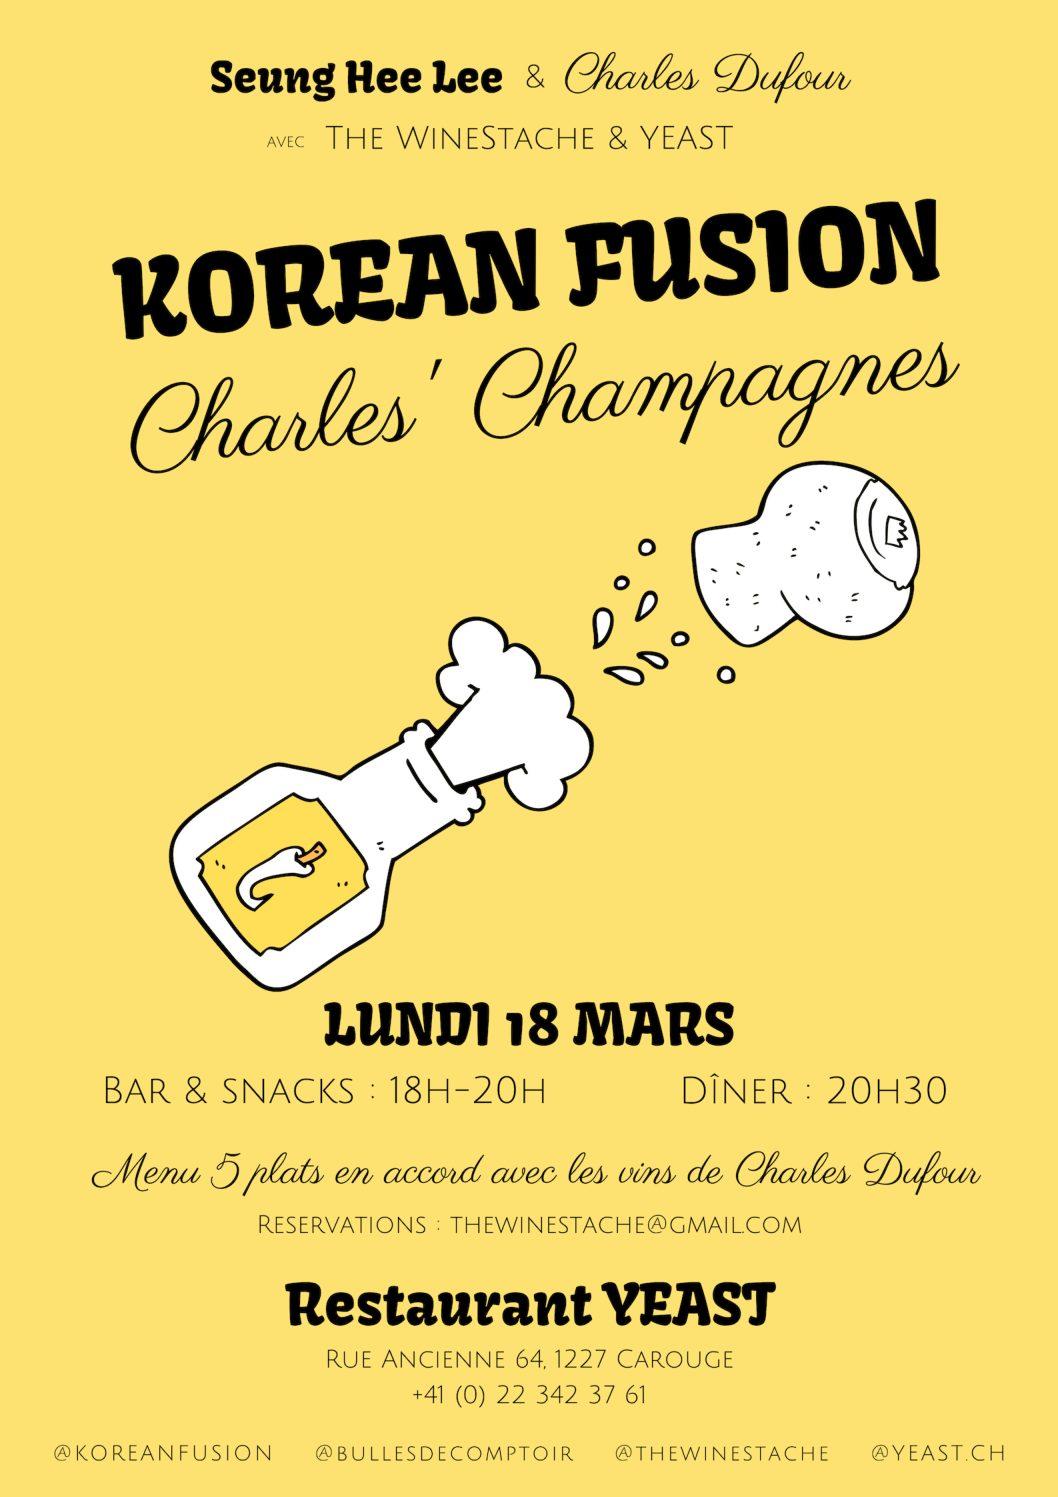 Korean fusion & Charles  Dufour